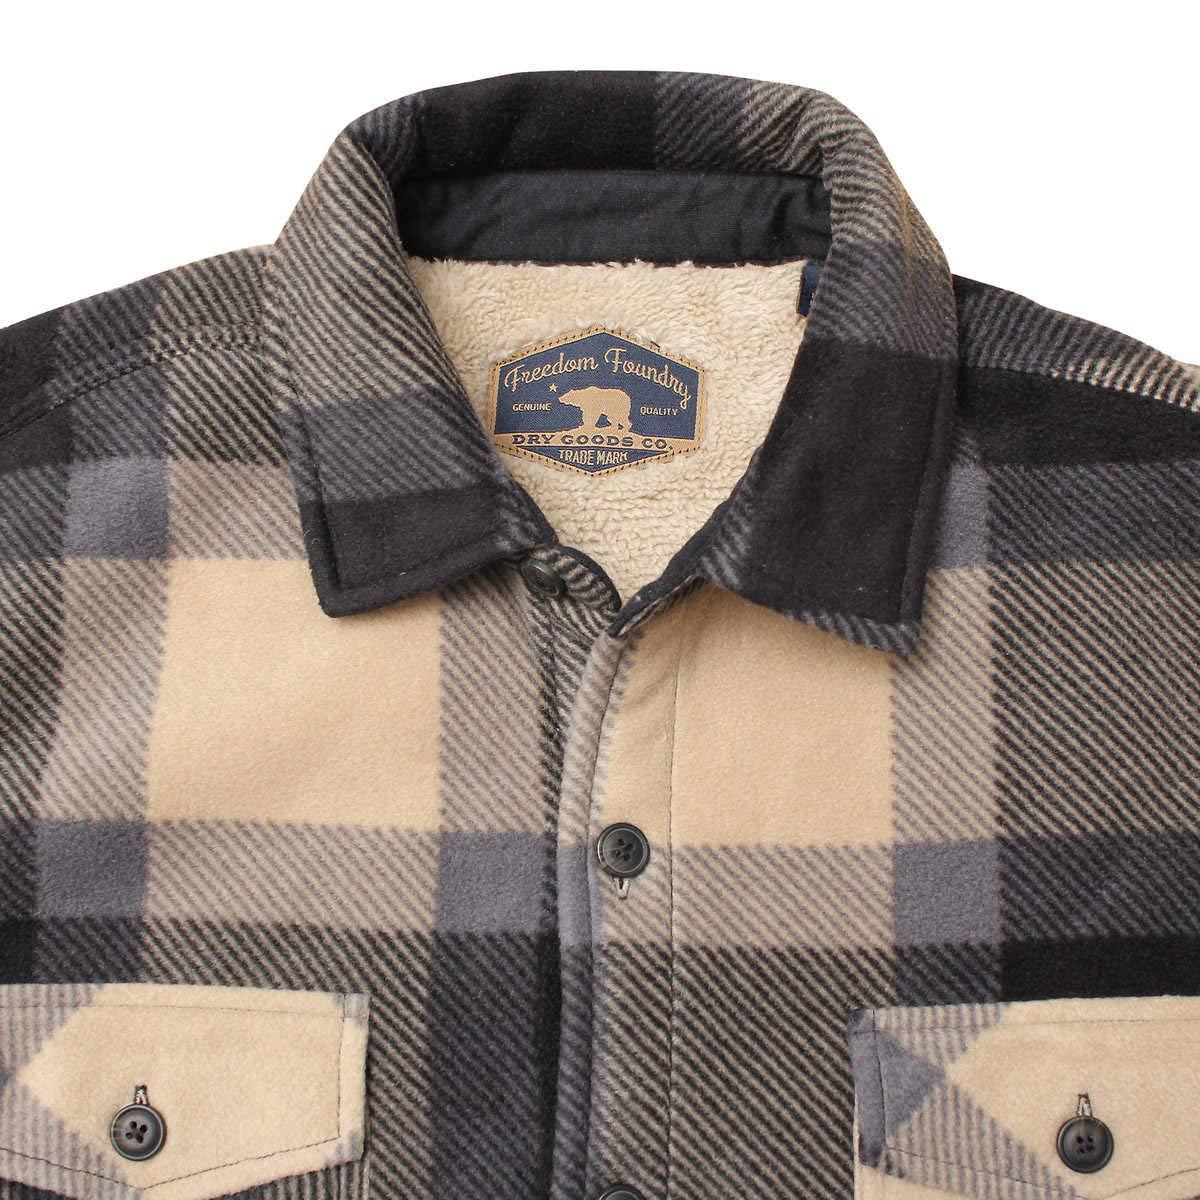 Freedom Foundry Mens Plaid Fleece Jackets Super Plush Sherpa Lined Jacket Shirt